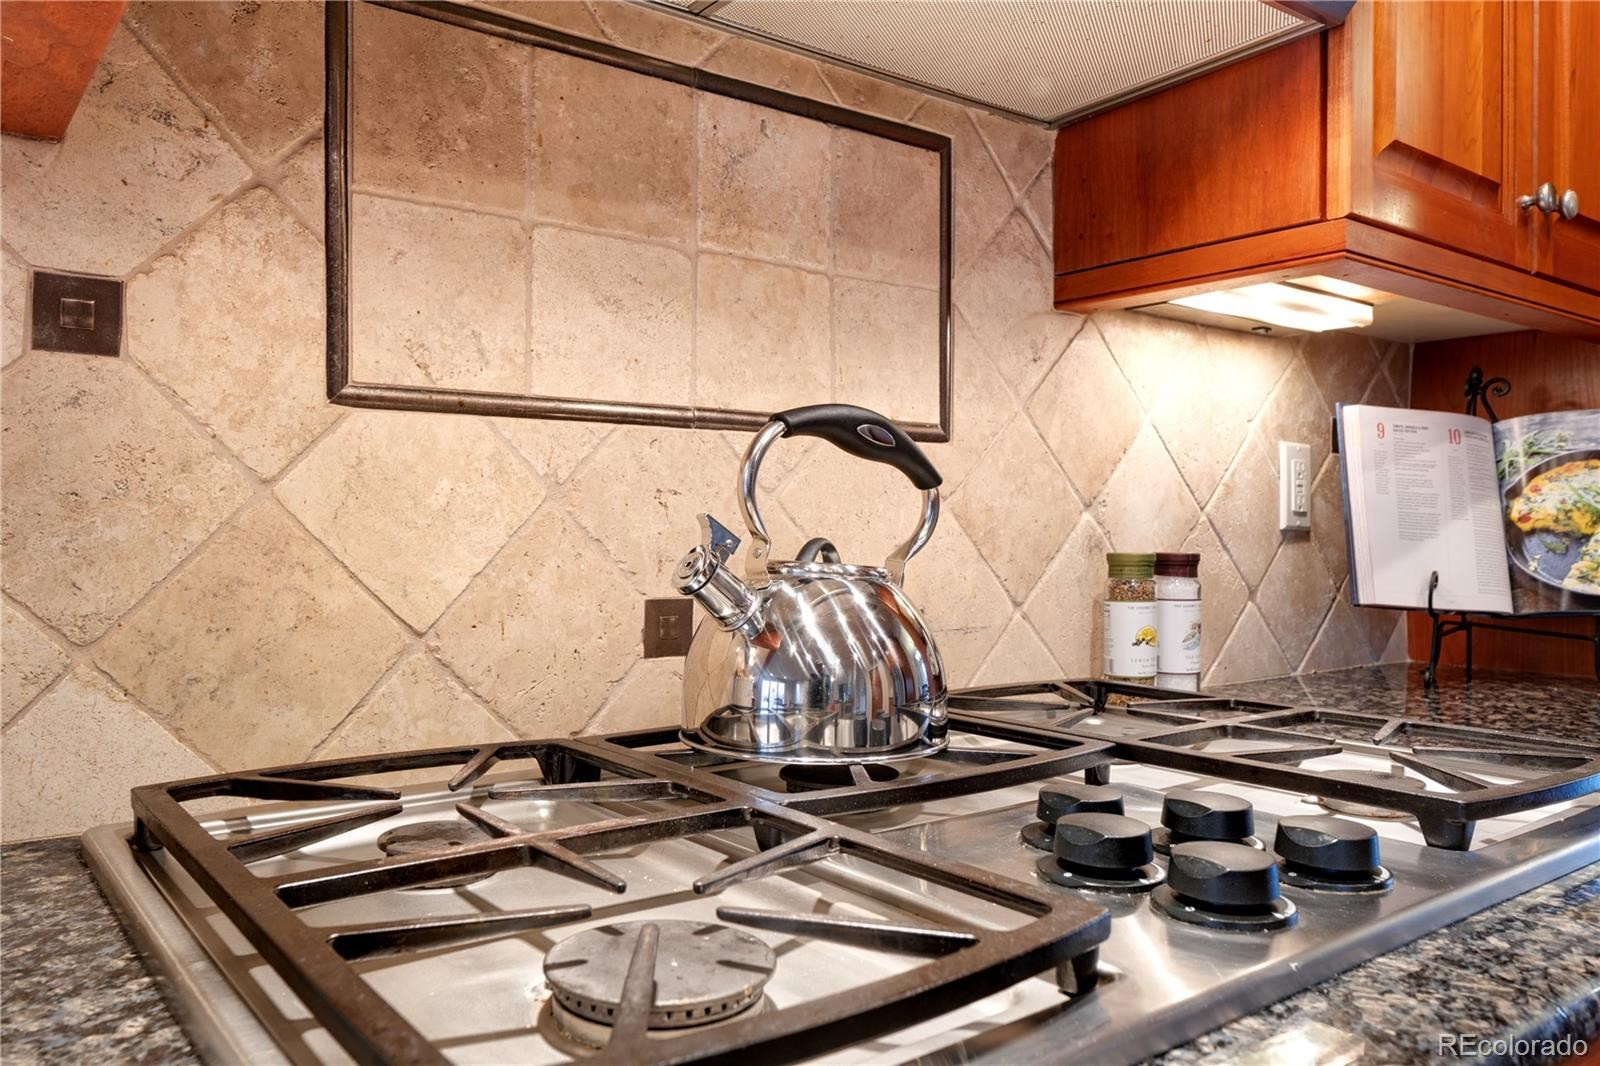 MLS# 9170952 - 14 - 1412 Onyx Circle, Longmont, CO 80504